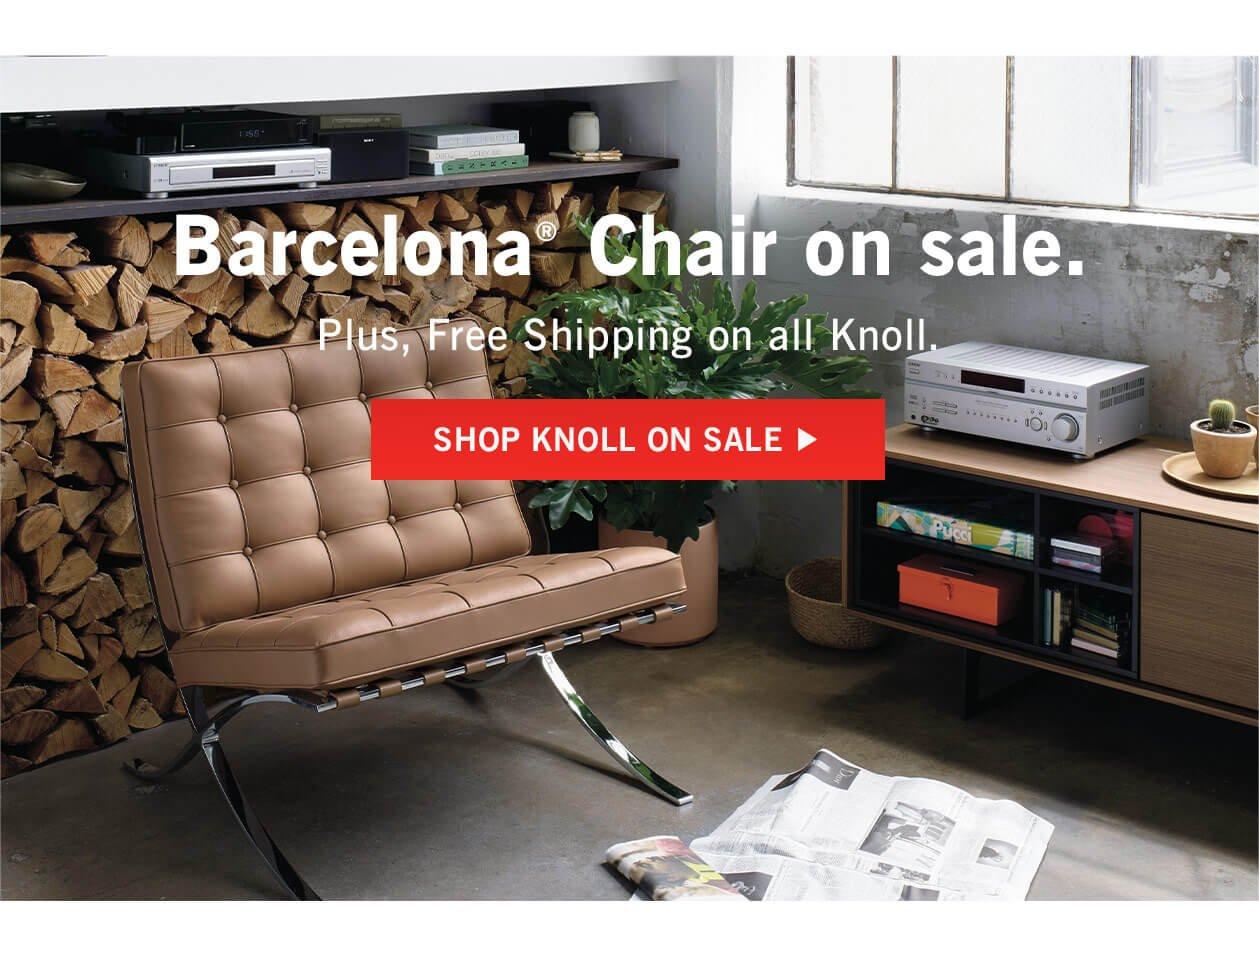 Shop Knoll on Sale